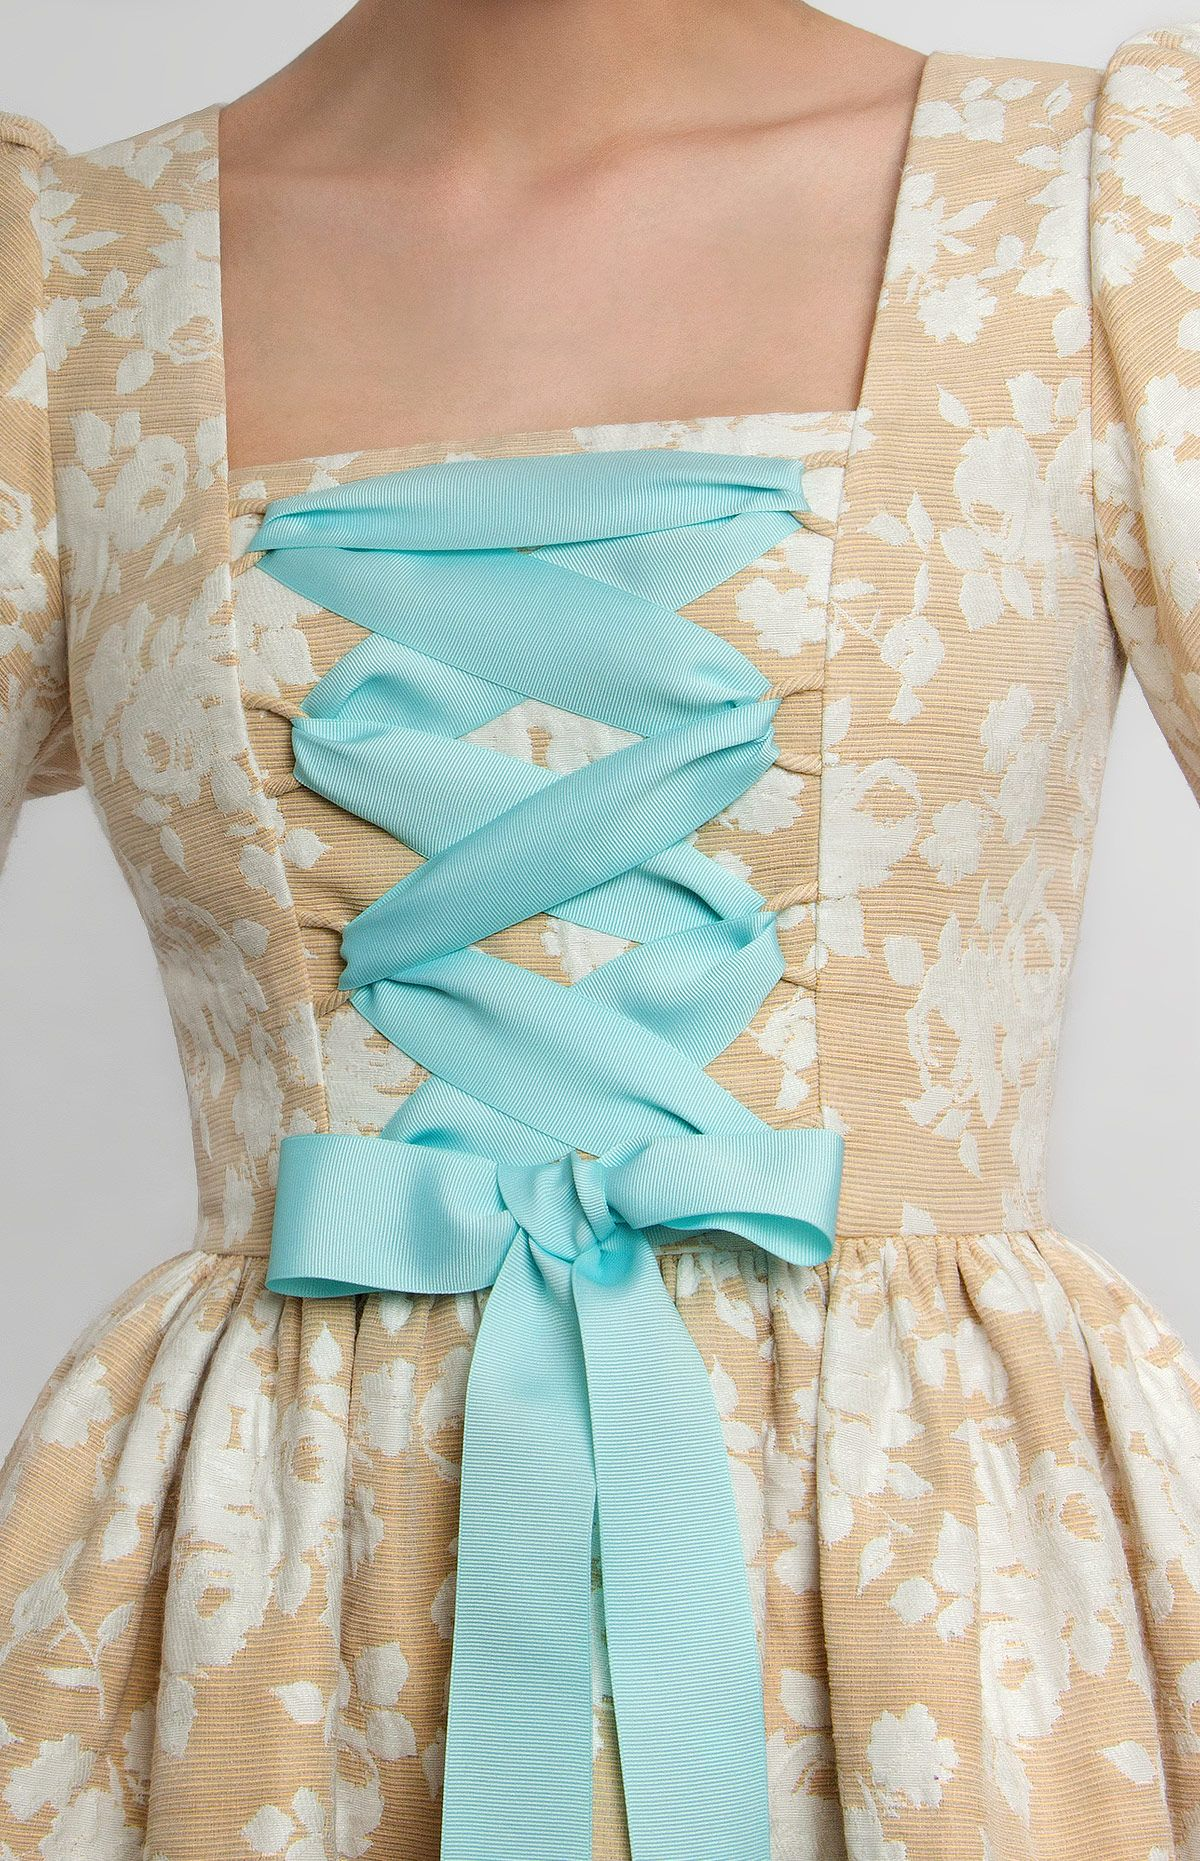 Balloon natural jacquard cotton dress trimmed with ribbon. Balloon ...